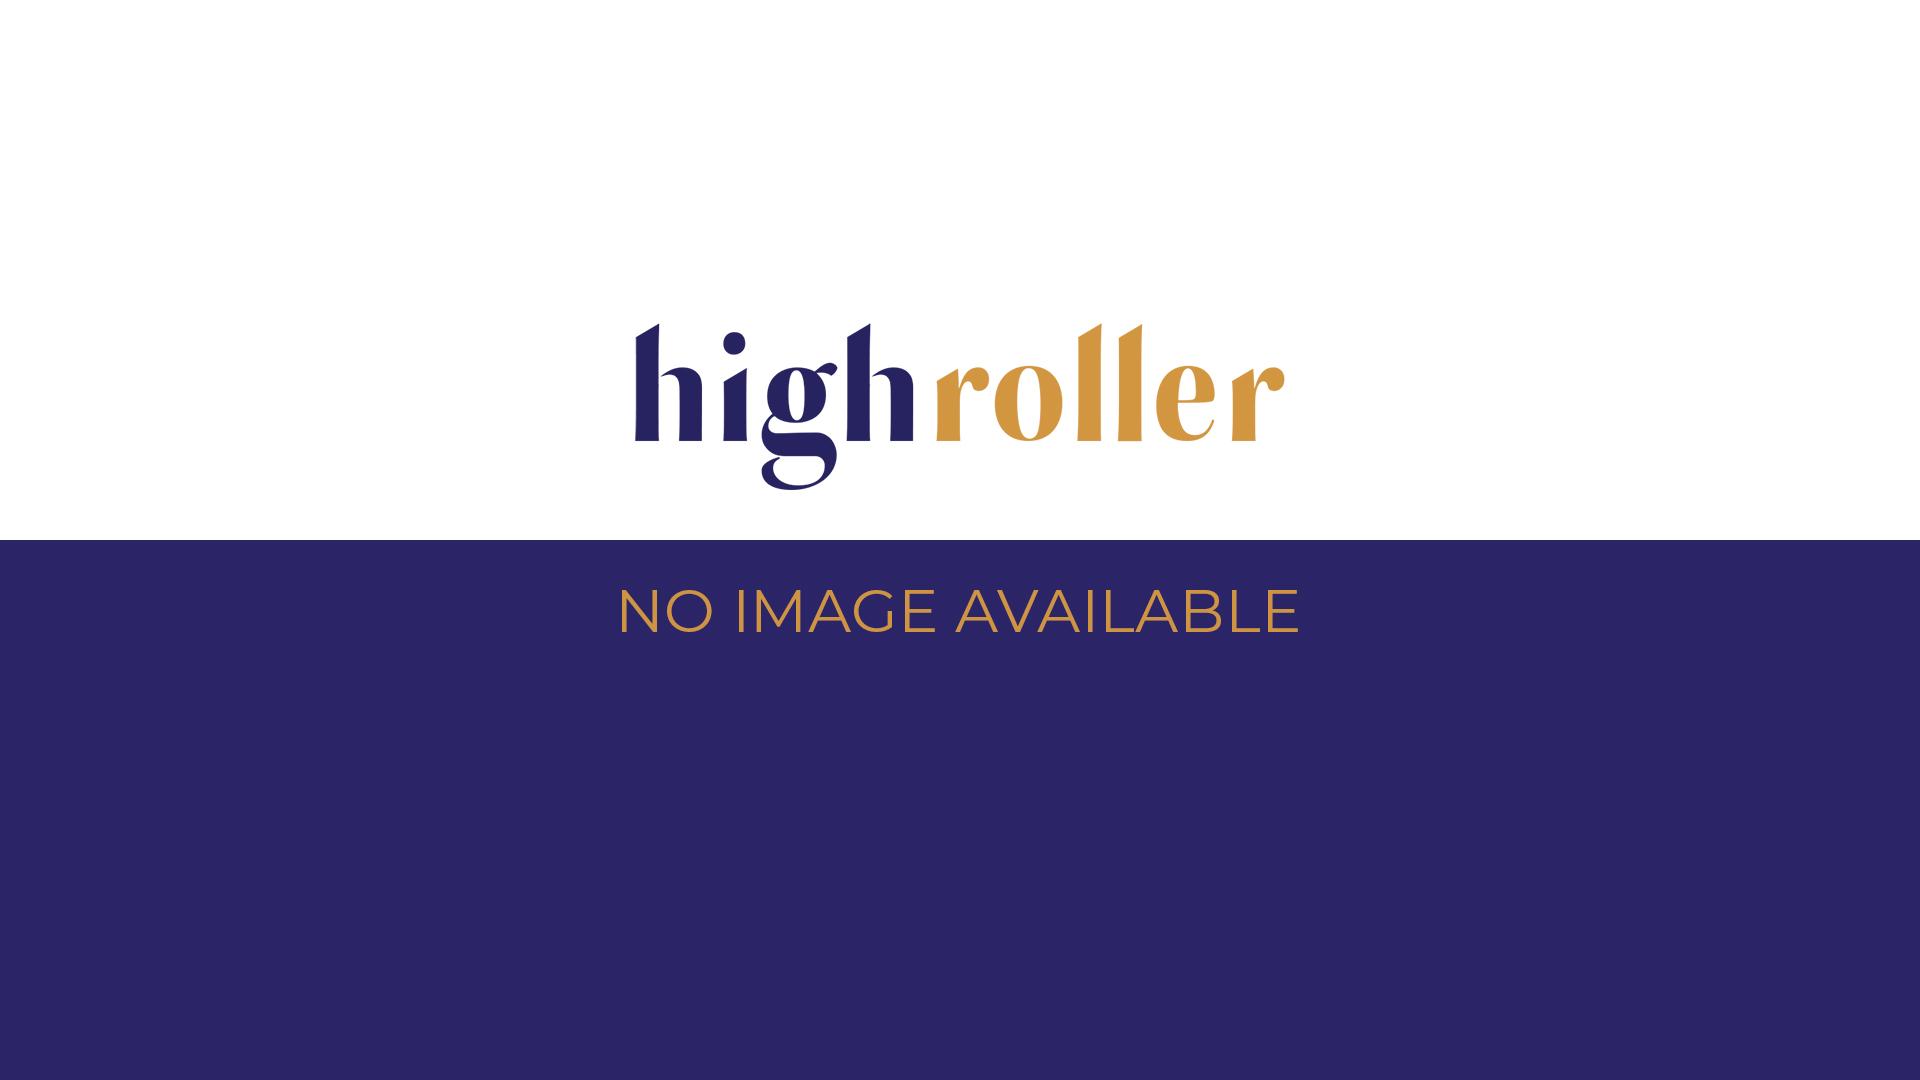 Blackjack Casinos - 38 Online Blackjack Providers Available